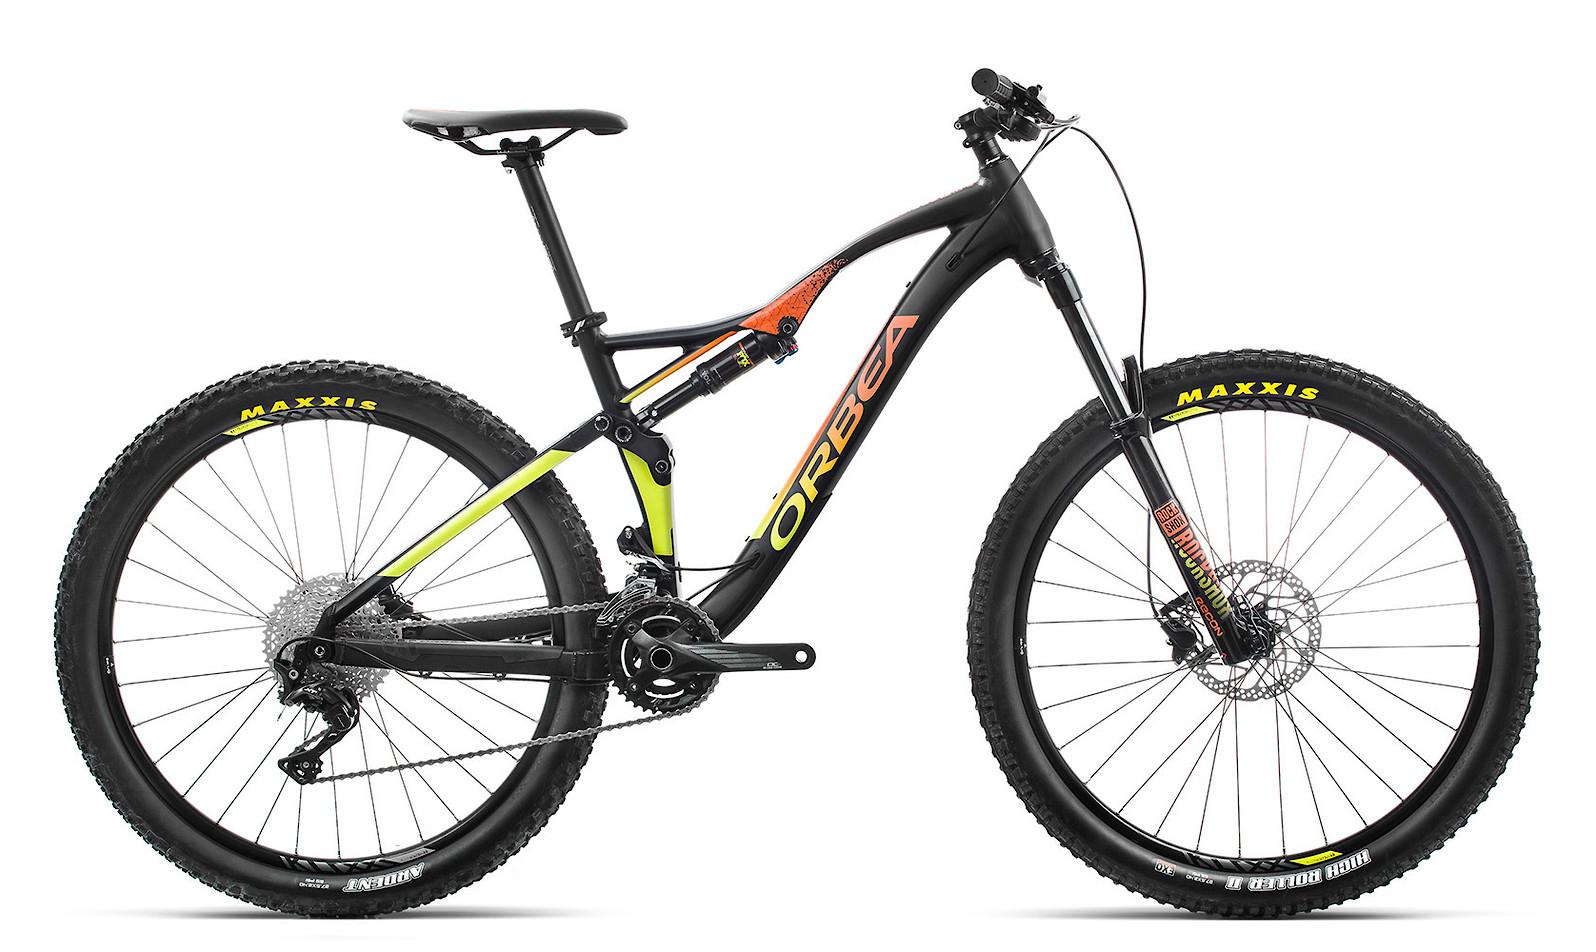 2019 Orbea Occam AM H50 Bike